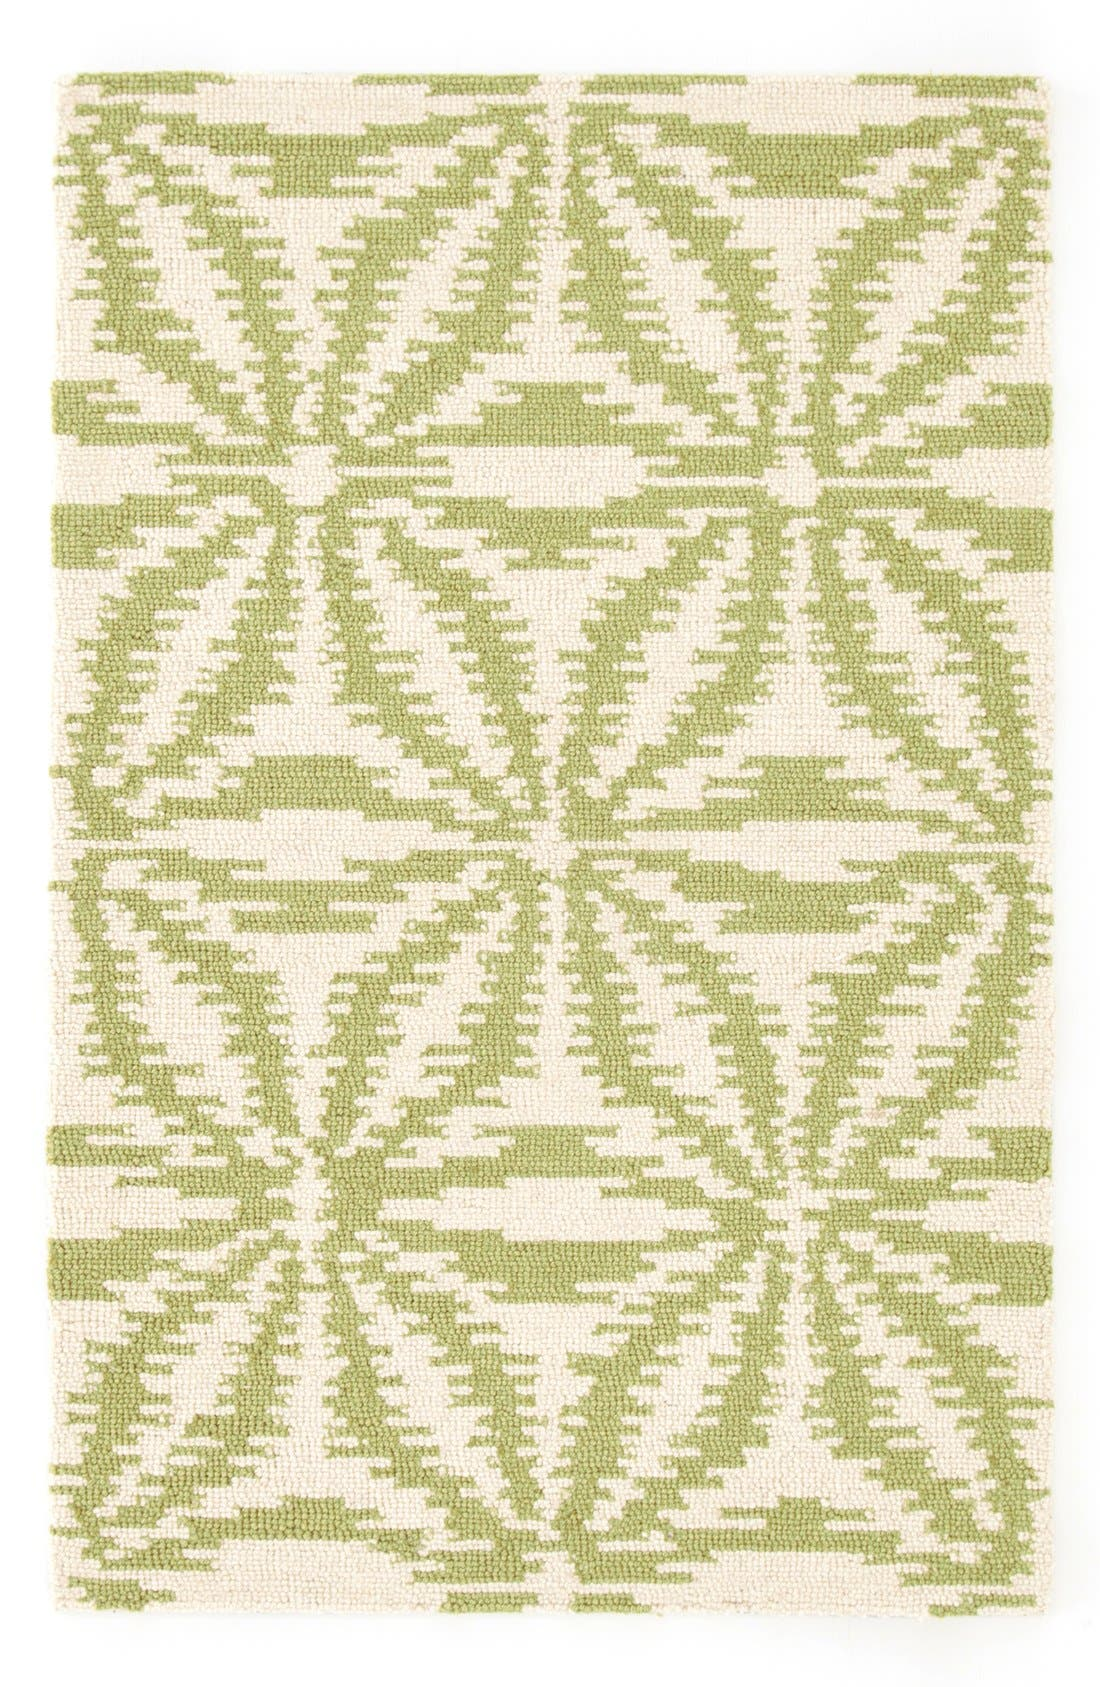 Alternate Image 1 Selected - Dash & Albert ''Aster' Cotton Rug